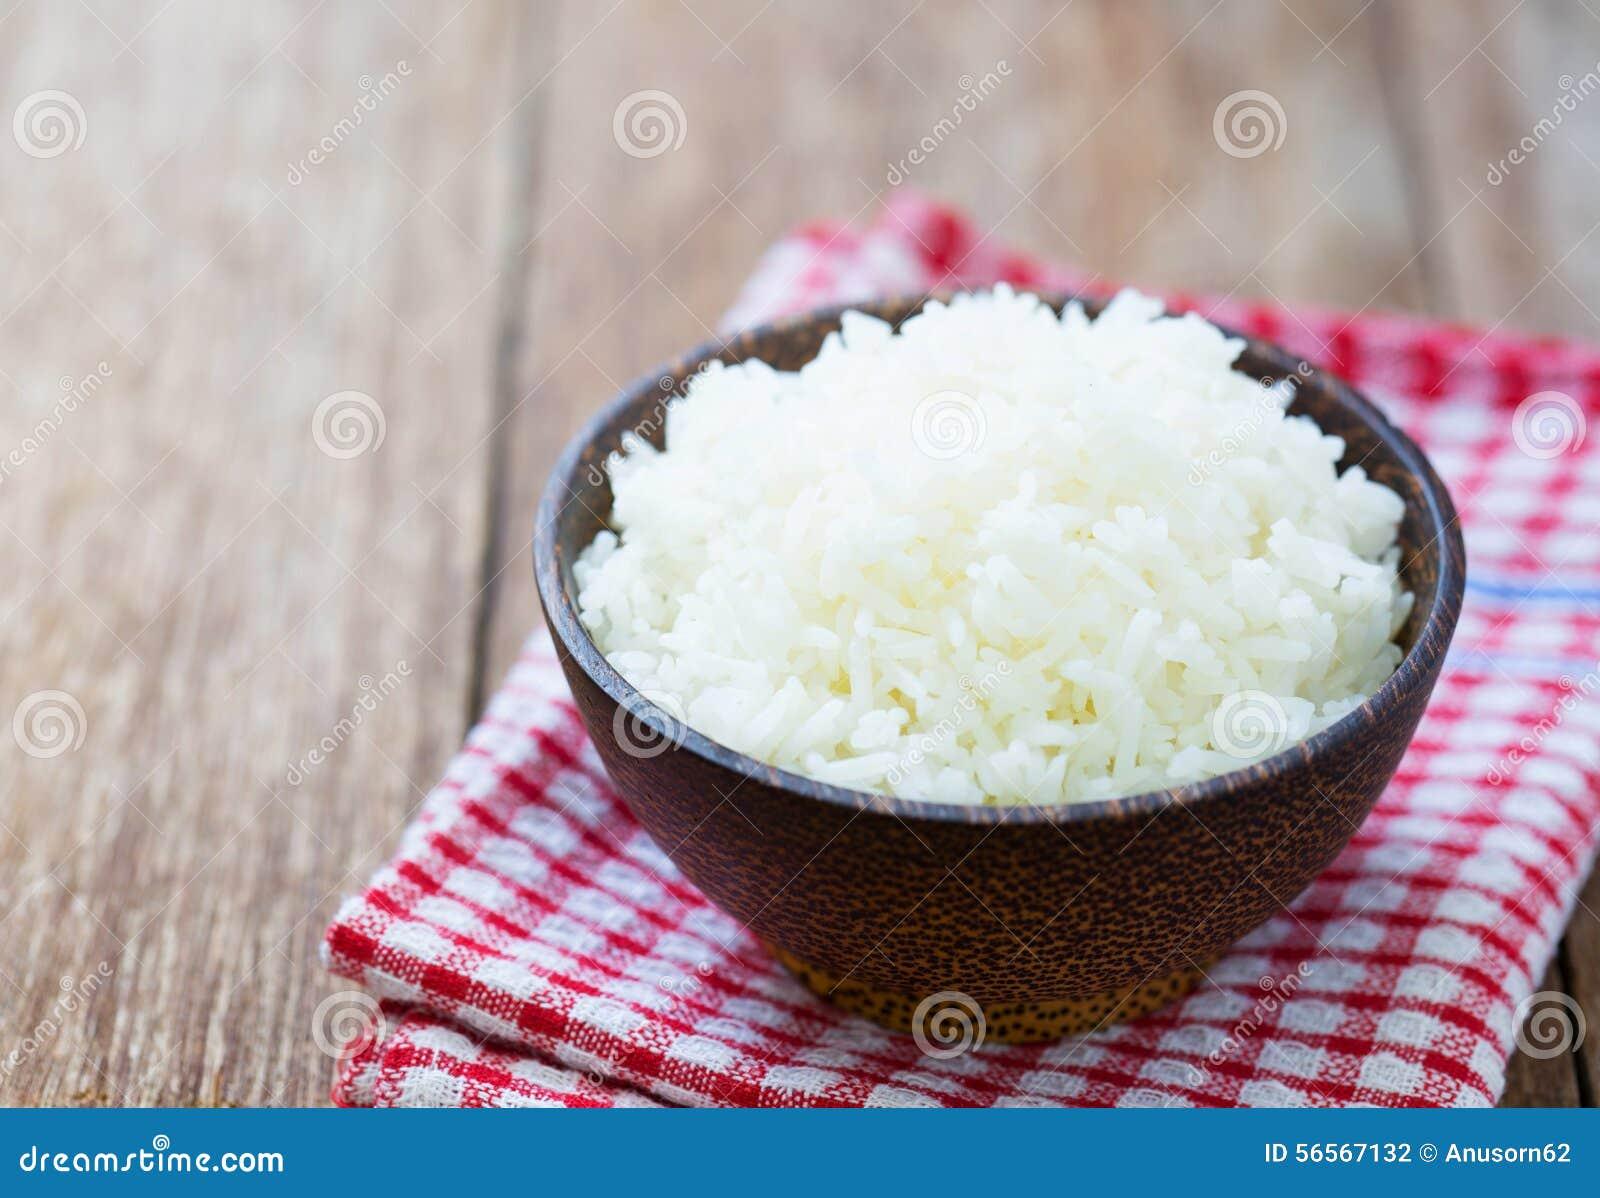 Download Ρύζι της Jasmine σε ένα κύπελλο ρυζιού Στοκ Εικόνες - εικόνα από γεύμα, course: 56567132